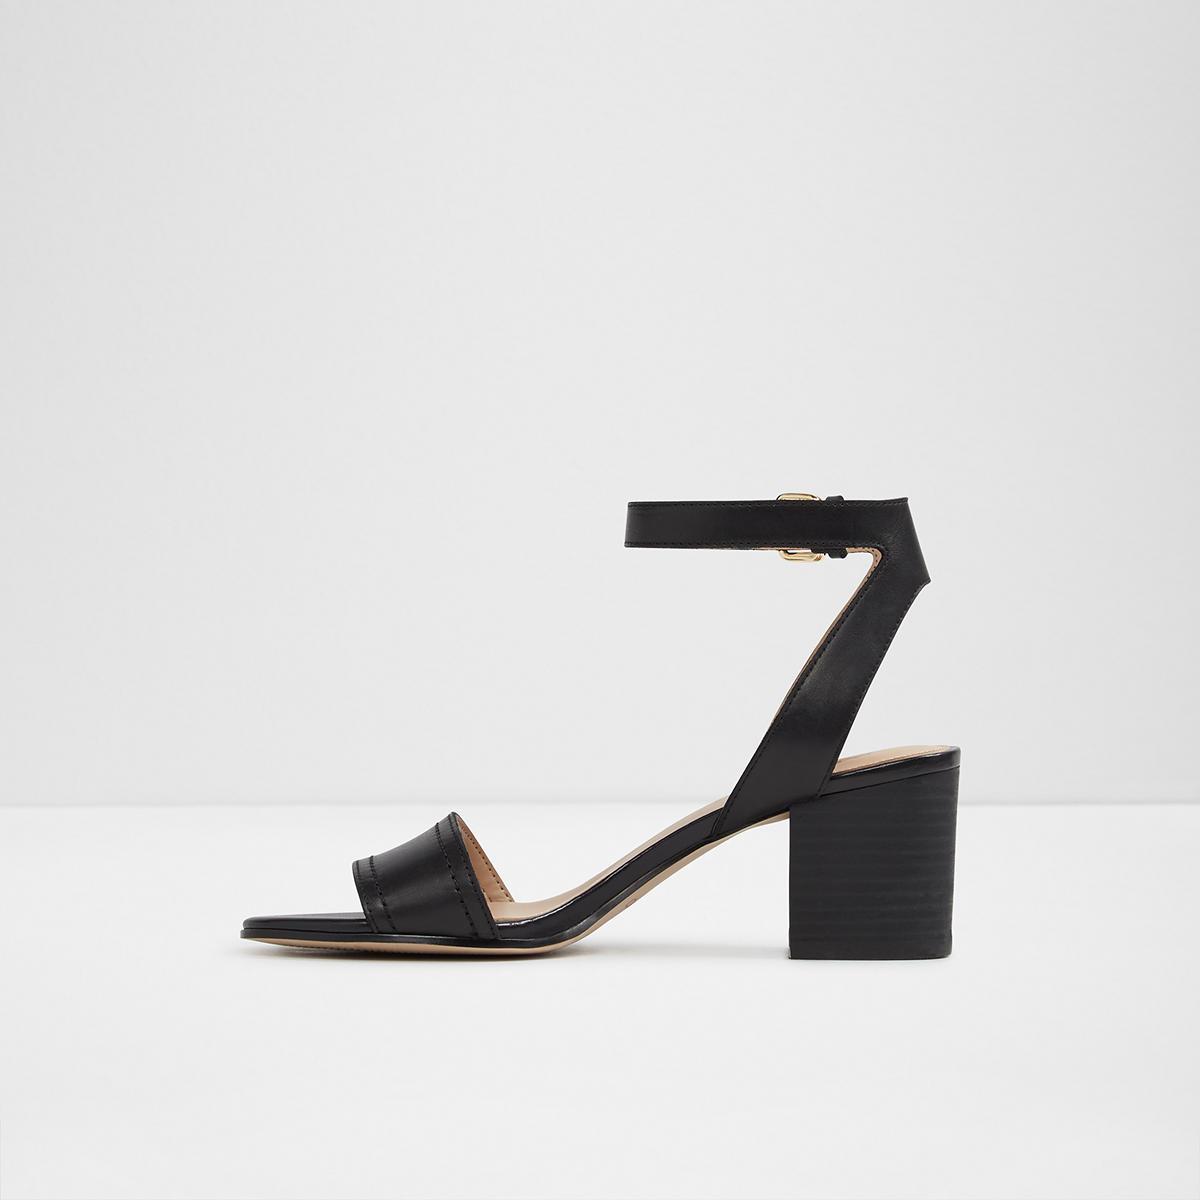 Sandales Avec Ceinture Noire Lolla Aldo JaxFWZSTB